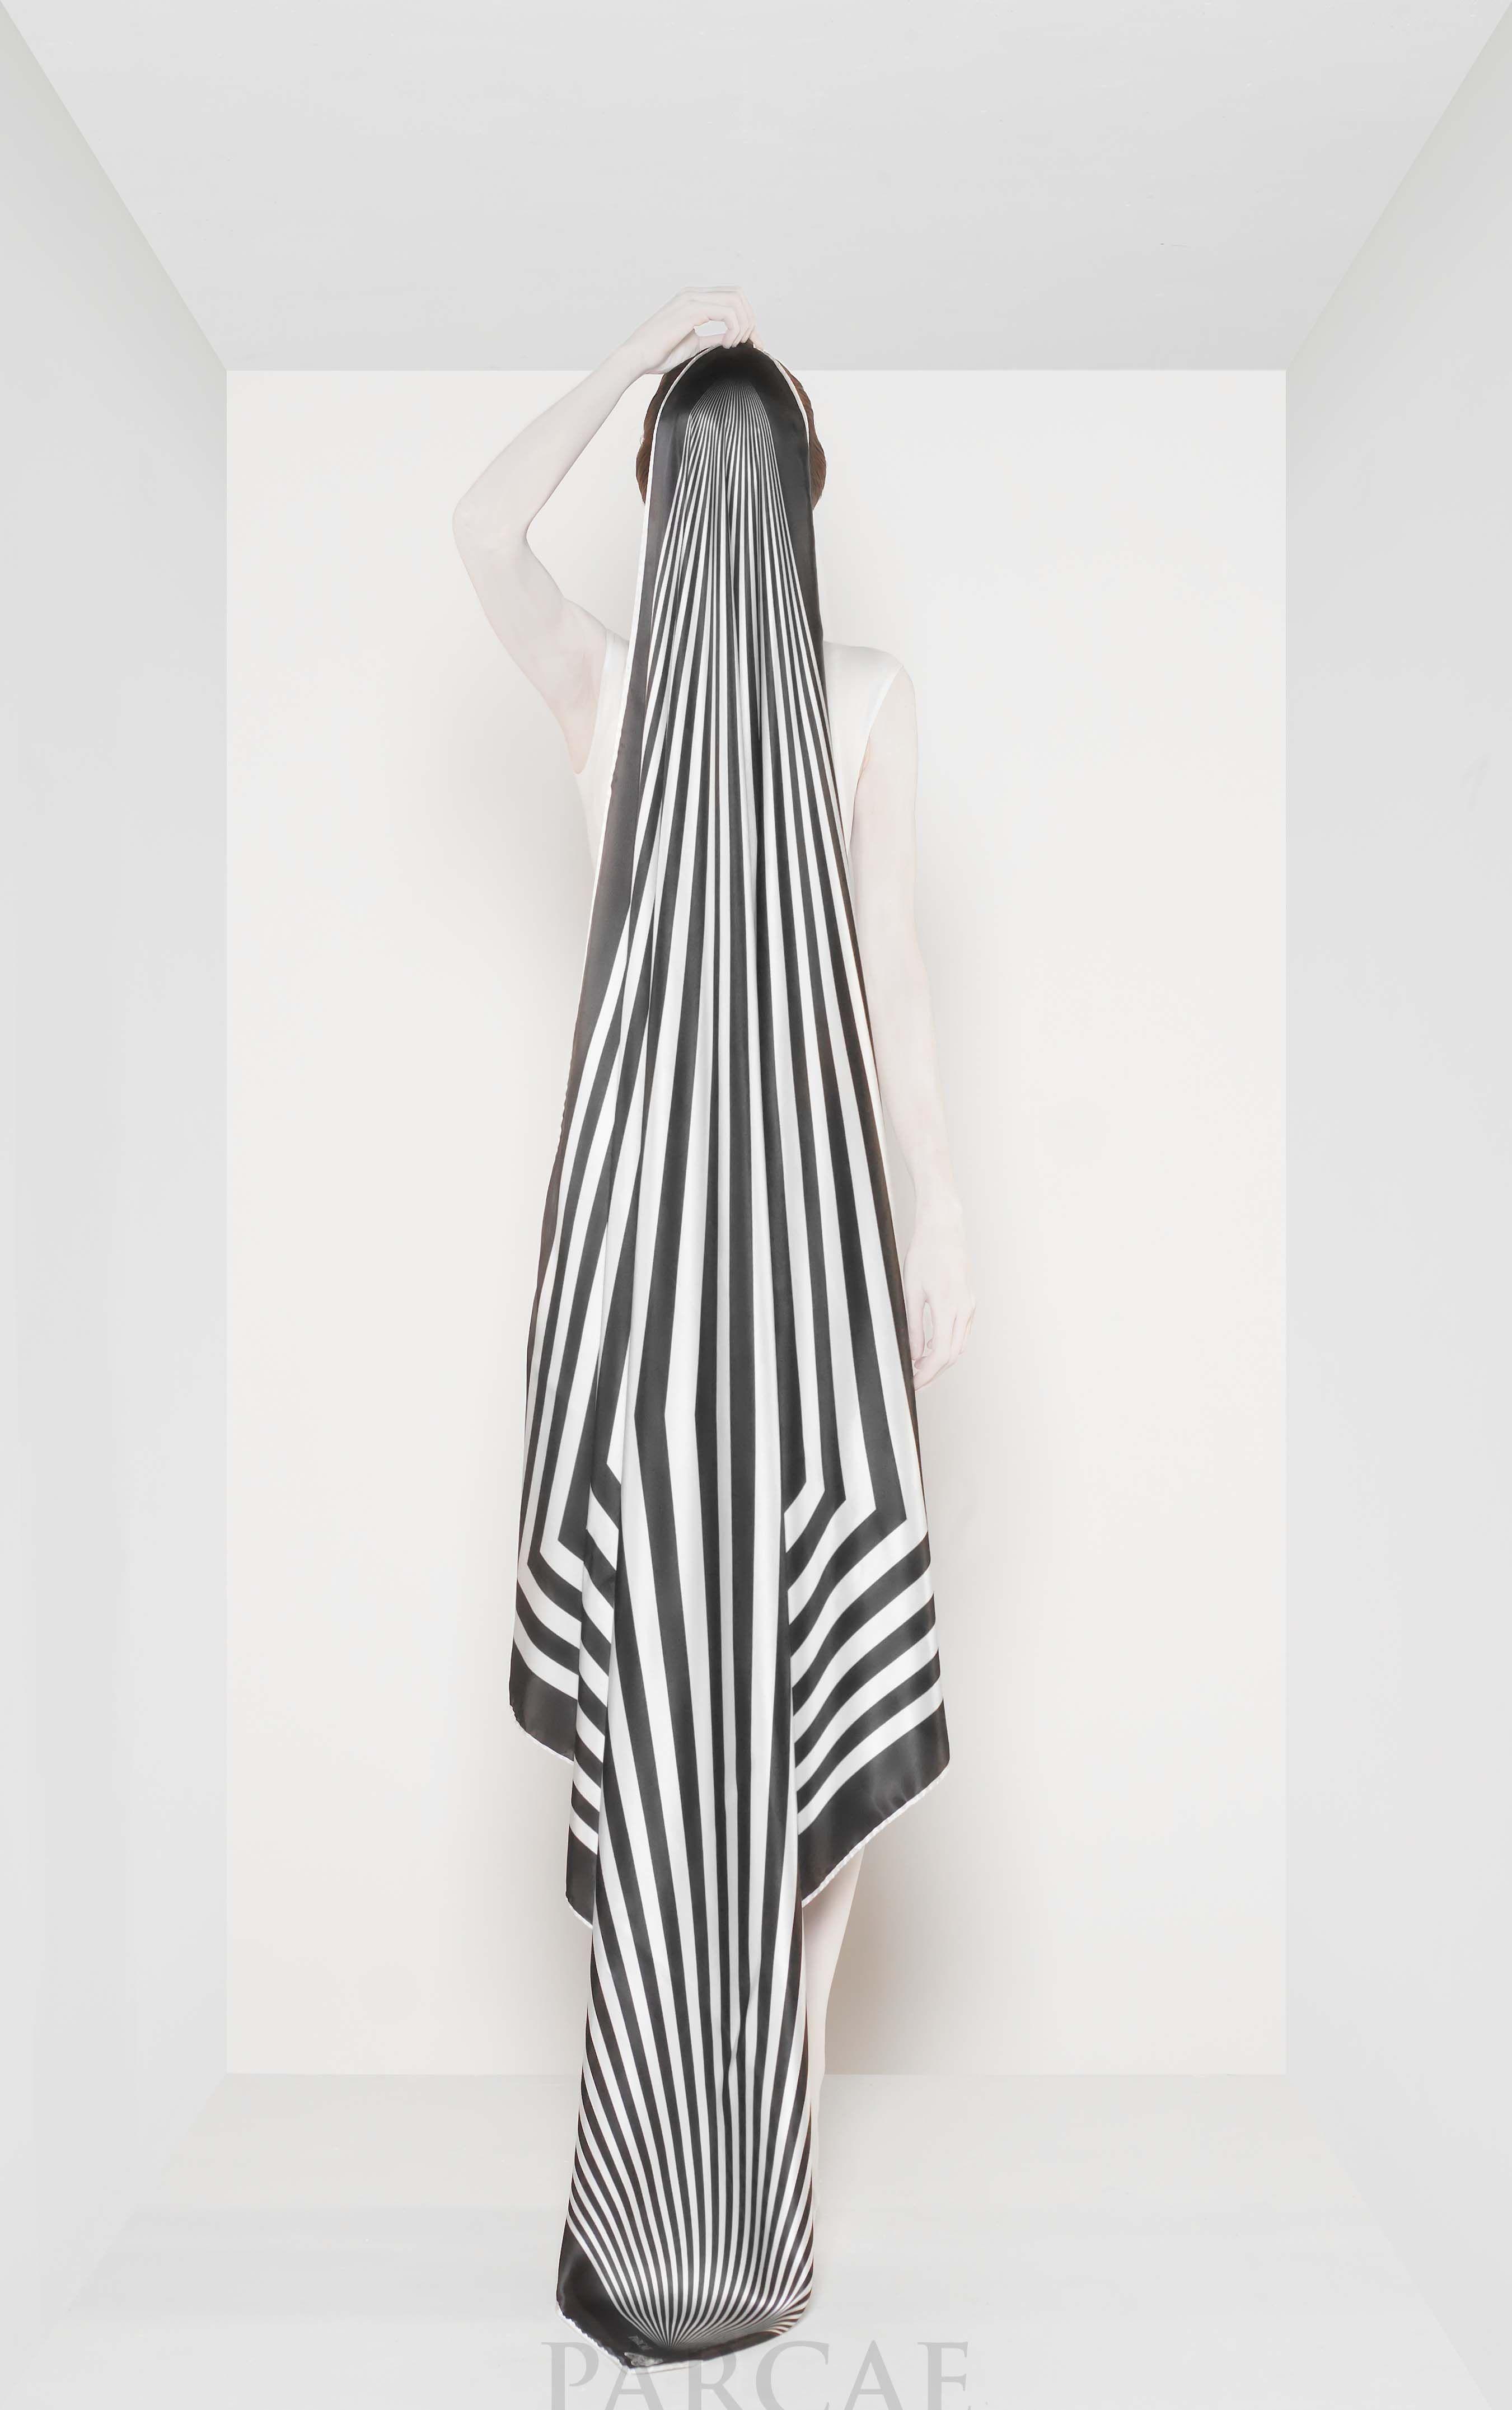 Visit www.parcae.it #fashion #art #chiffon #trend #madeinitaly #foulard #islamic #islamicsize #woman #chic #silk #satin #tradition #foulardaddicted #foulards #style #moda #modaitaliana #fashionweek #elegance #wishlist #carré #islamicsizes #luxury #fw2014 #black #white #shopping #georgette #beautiful